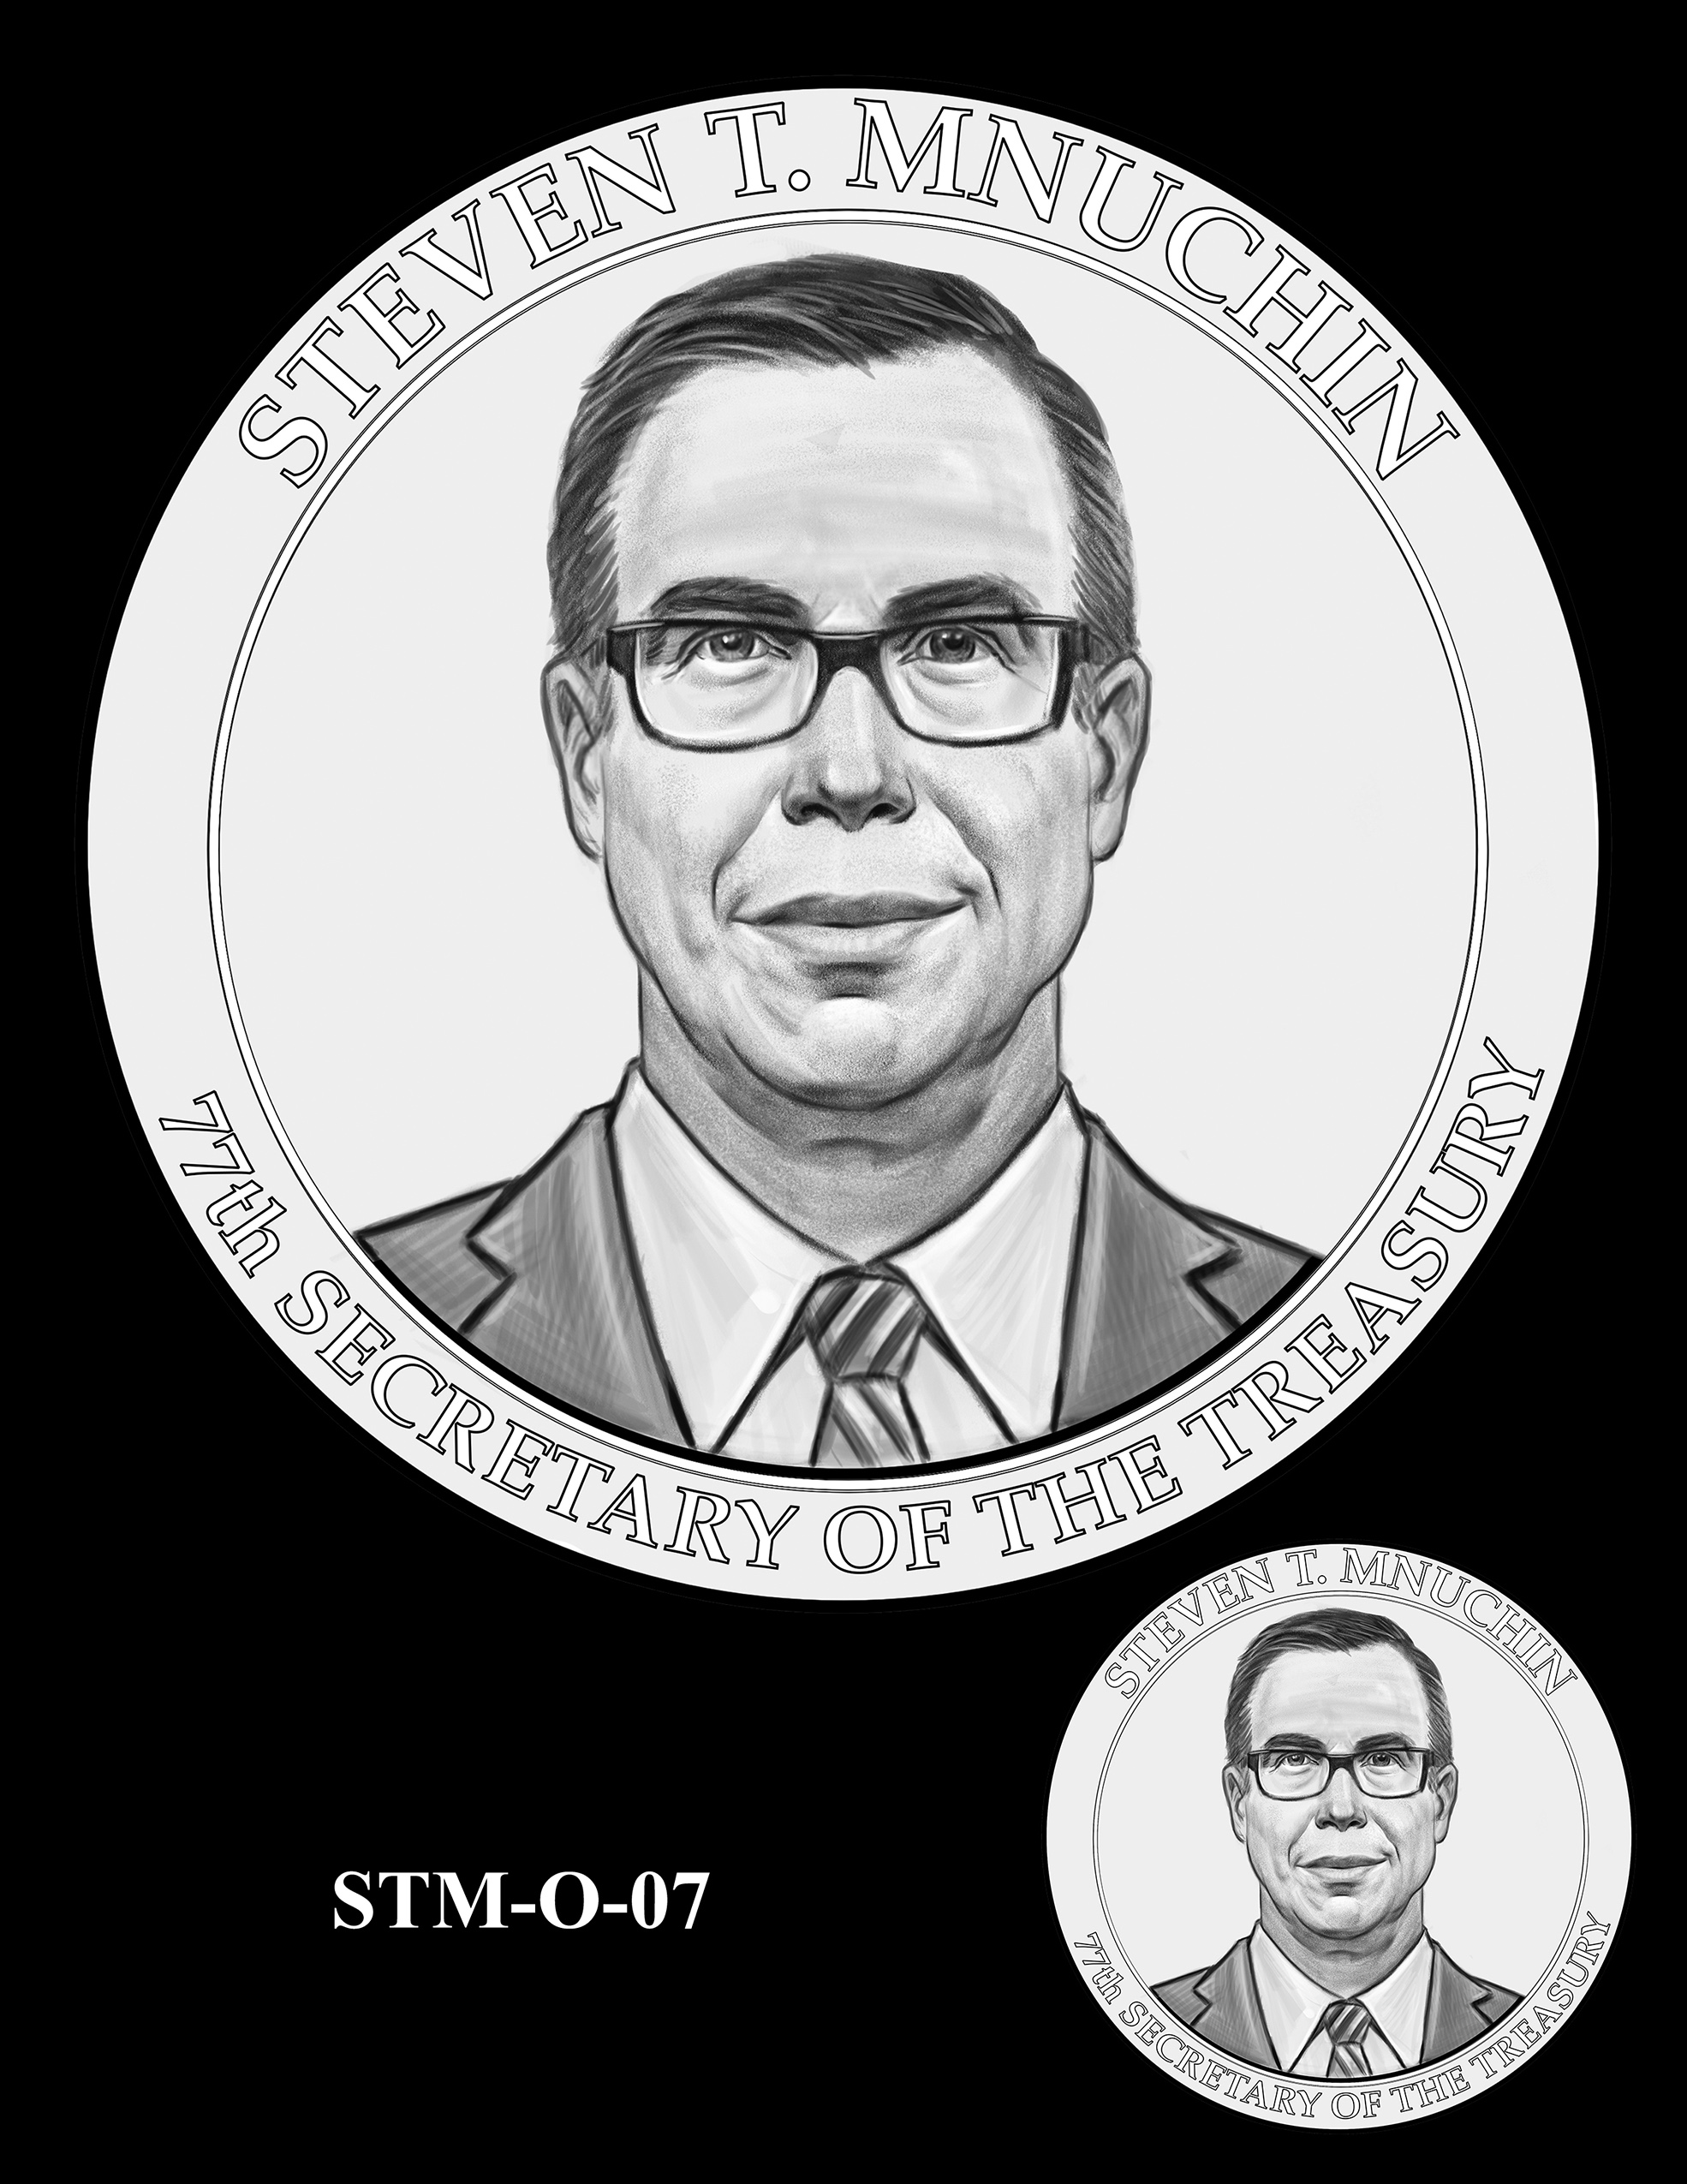 STM-O-07 -- Steven T. Mnuchin Secretary of the Treasury Medal